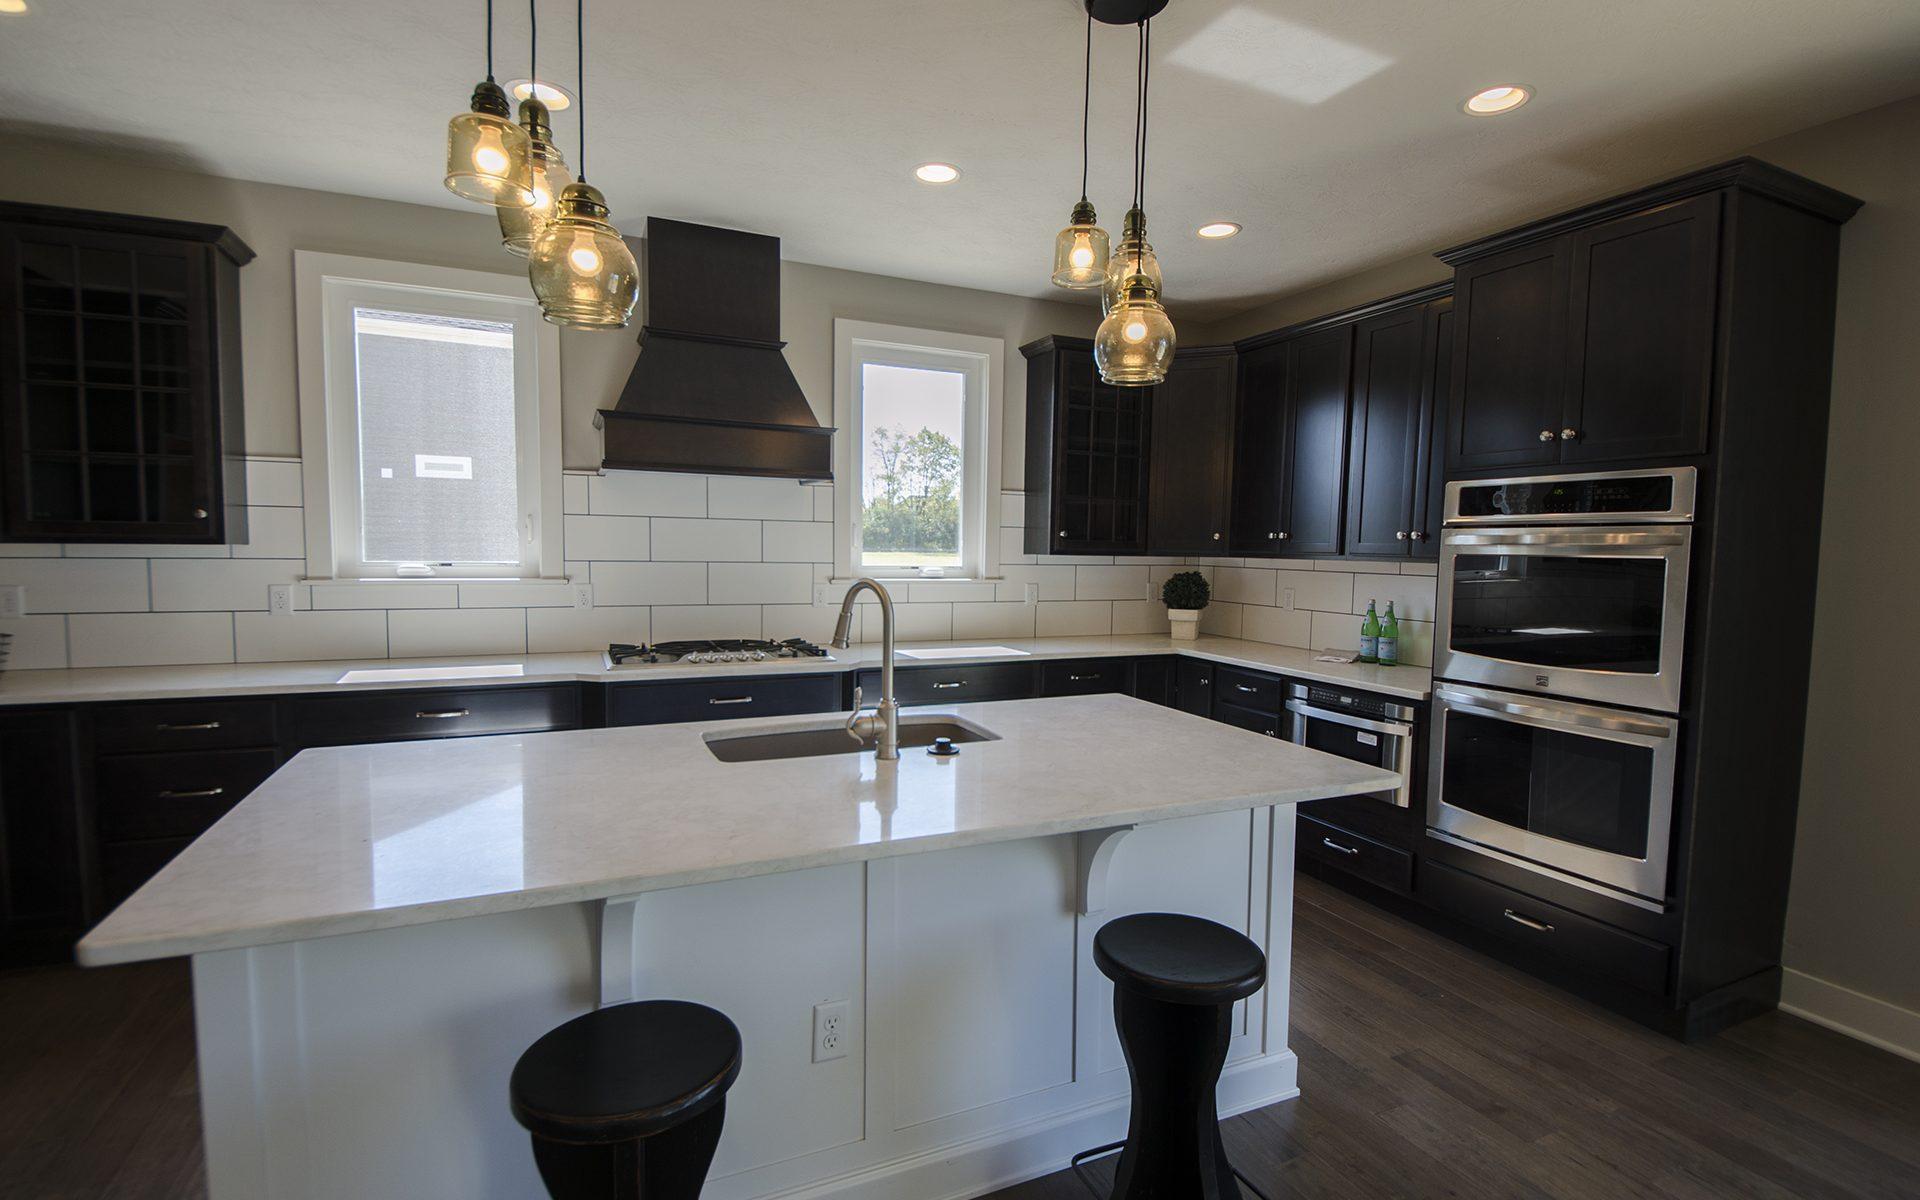 Emejing Classic Design Homes Billings Mt Ideas Decorating House